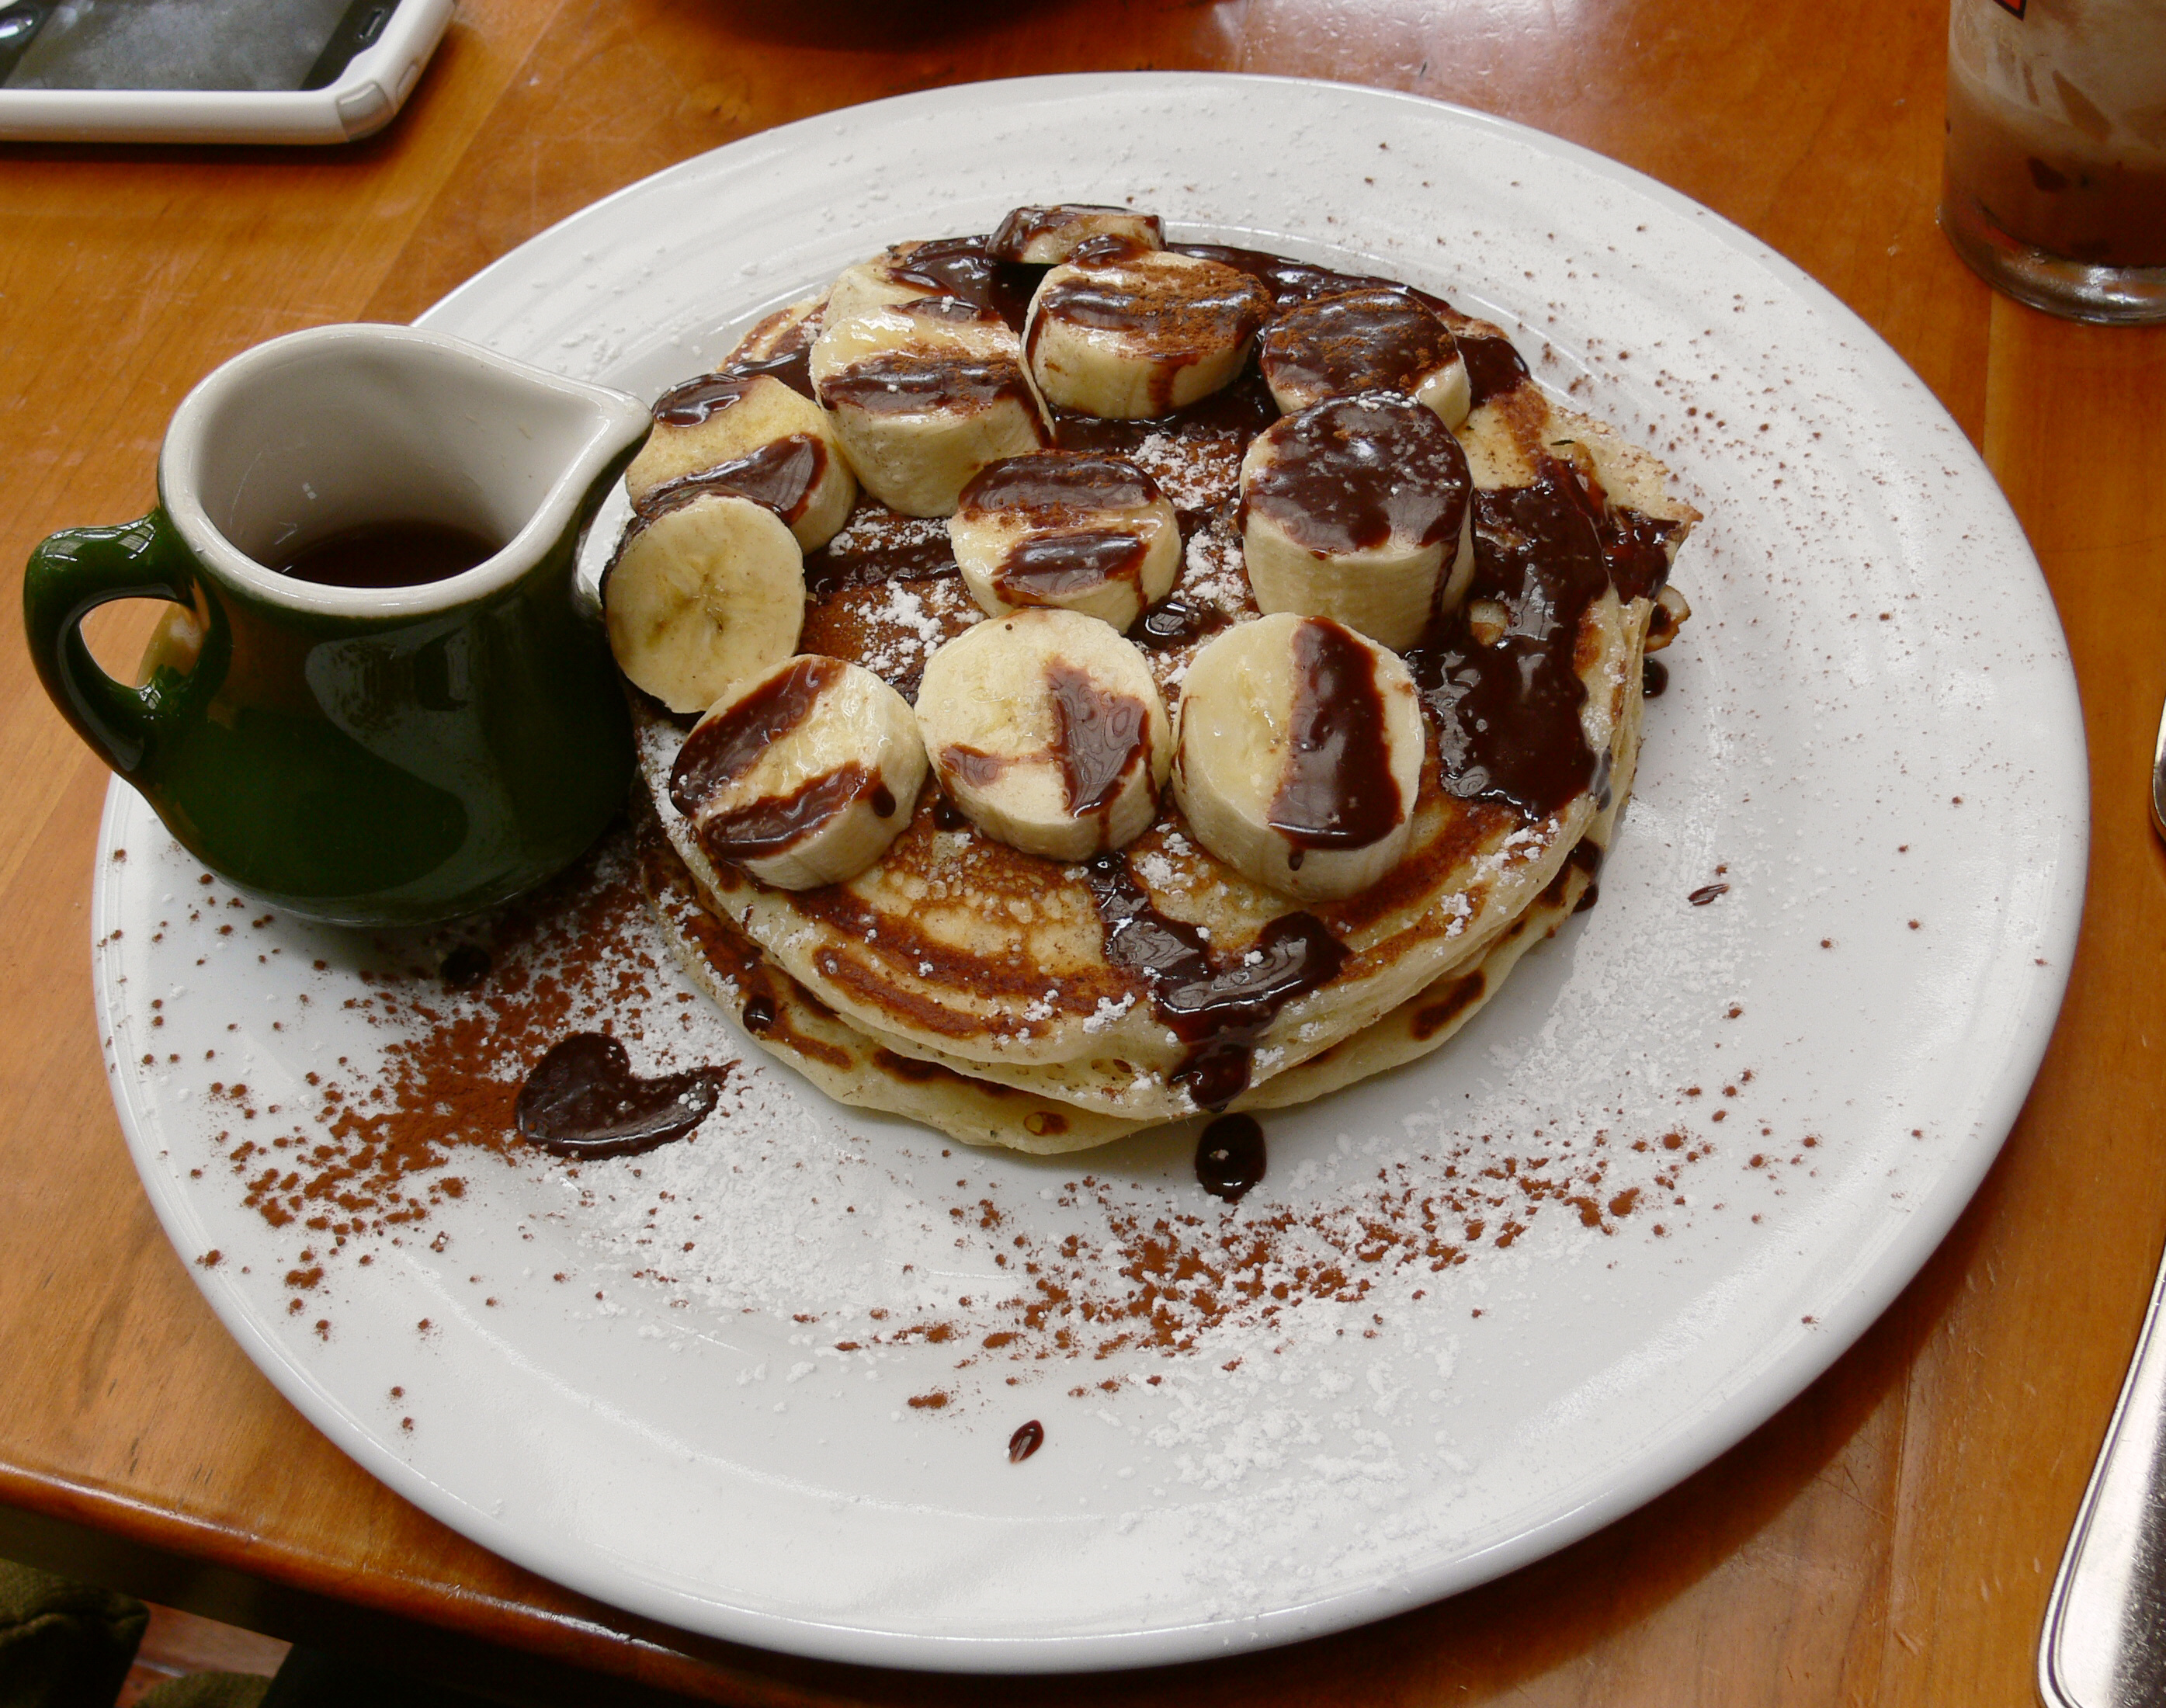 File Pancakes With Bananas And Chocolate Sauce Jpg